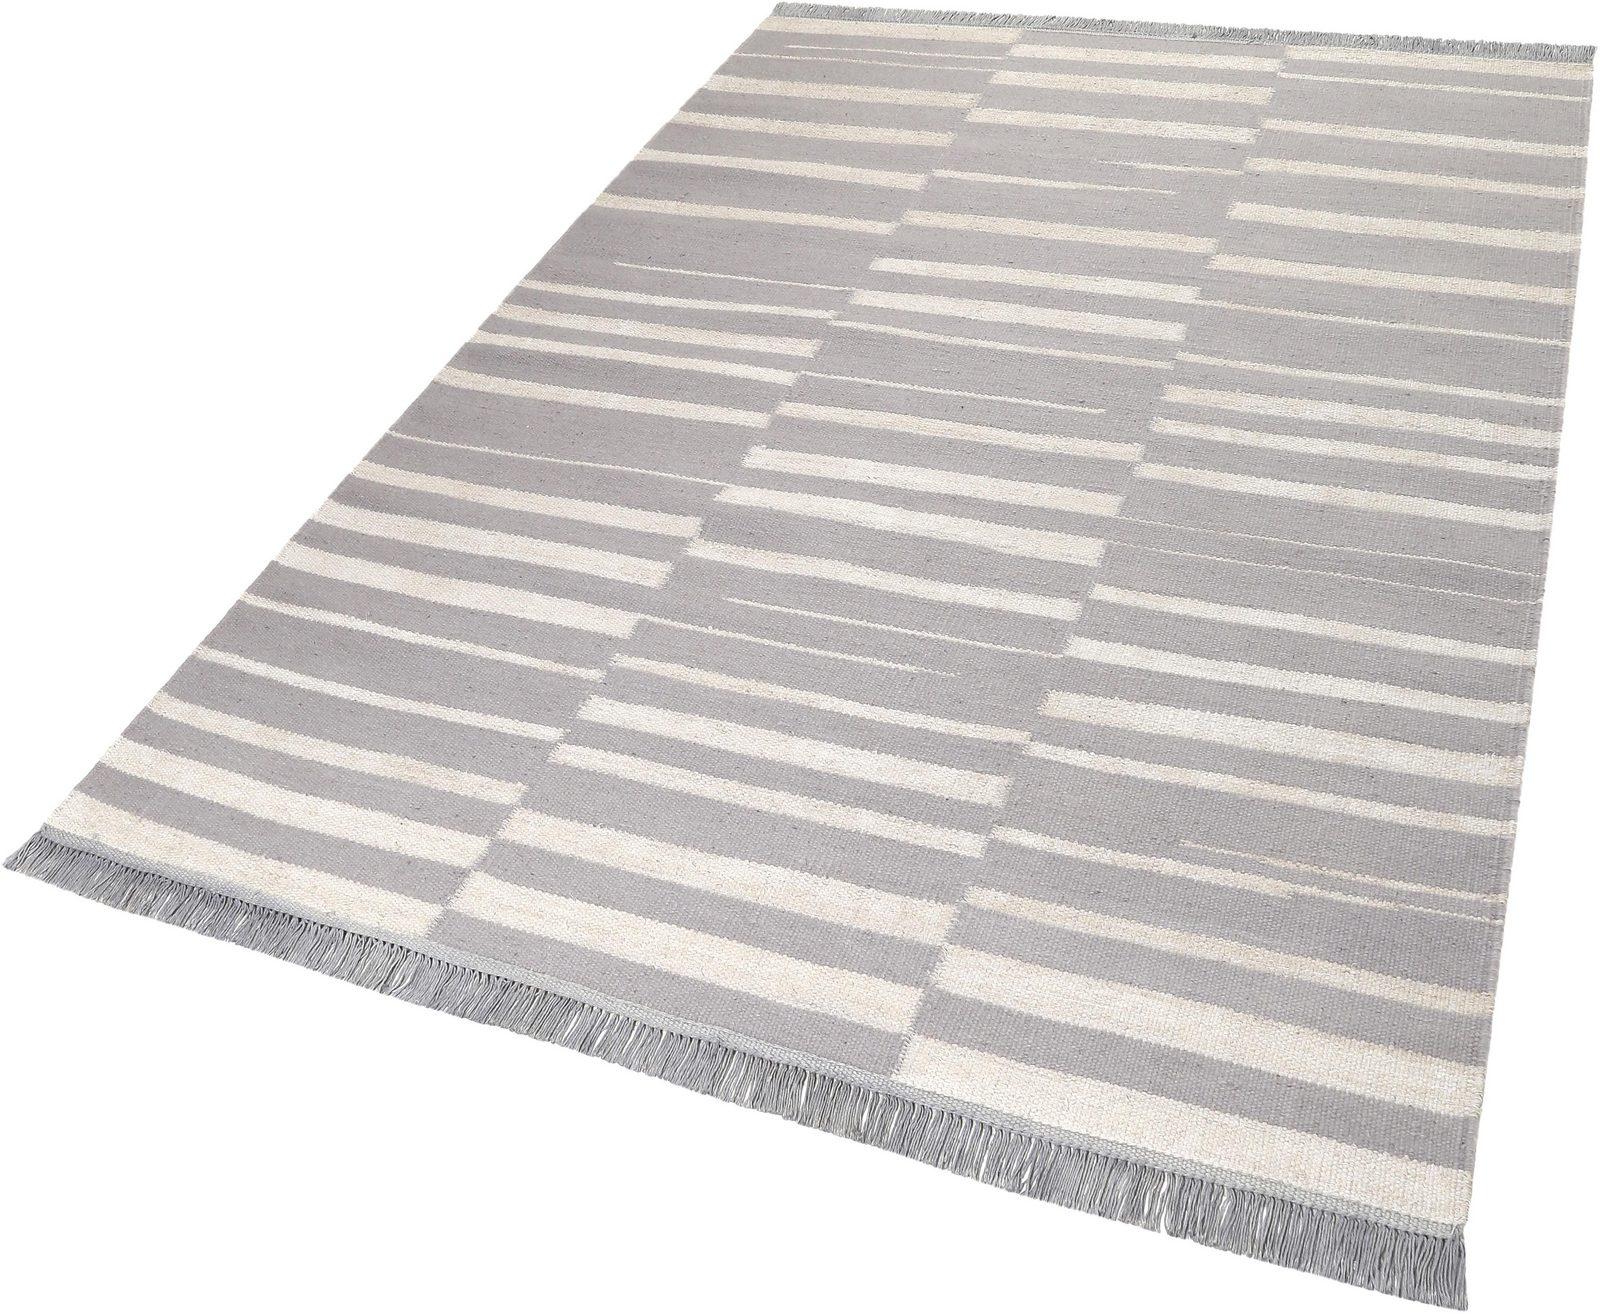 Teppich, Carpets&Co, »Skid Marks«, Höhe: 5 mm, handgewebt